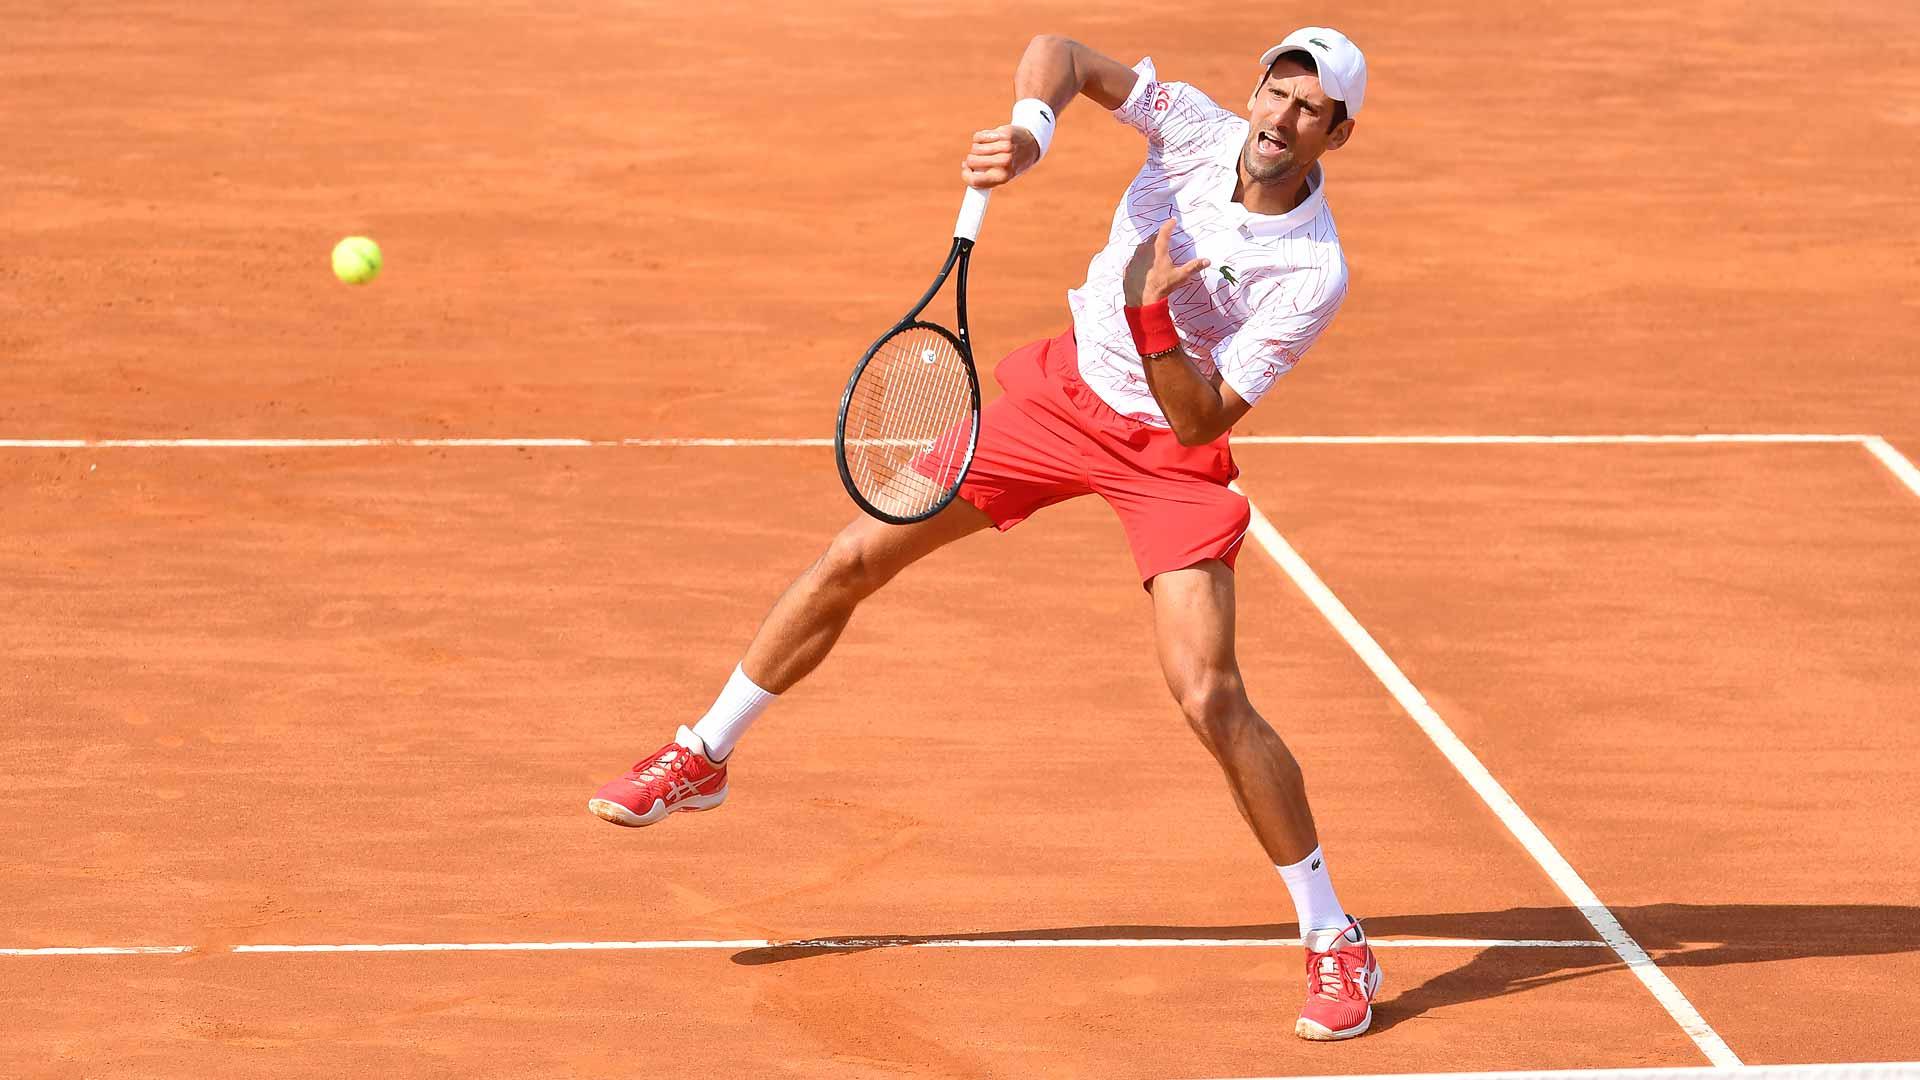 Double Digits Novak Djokovic Advances To 10th Rome Final Atp Tour Tennis